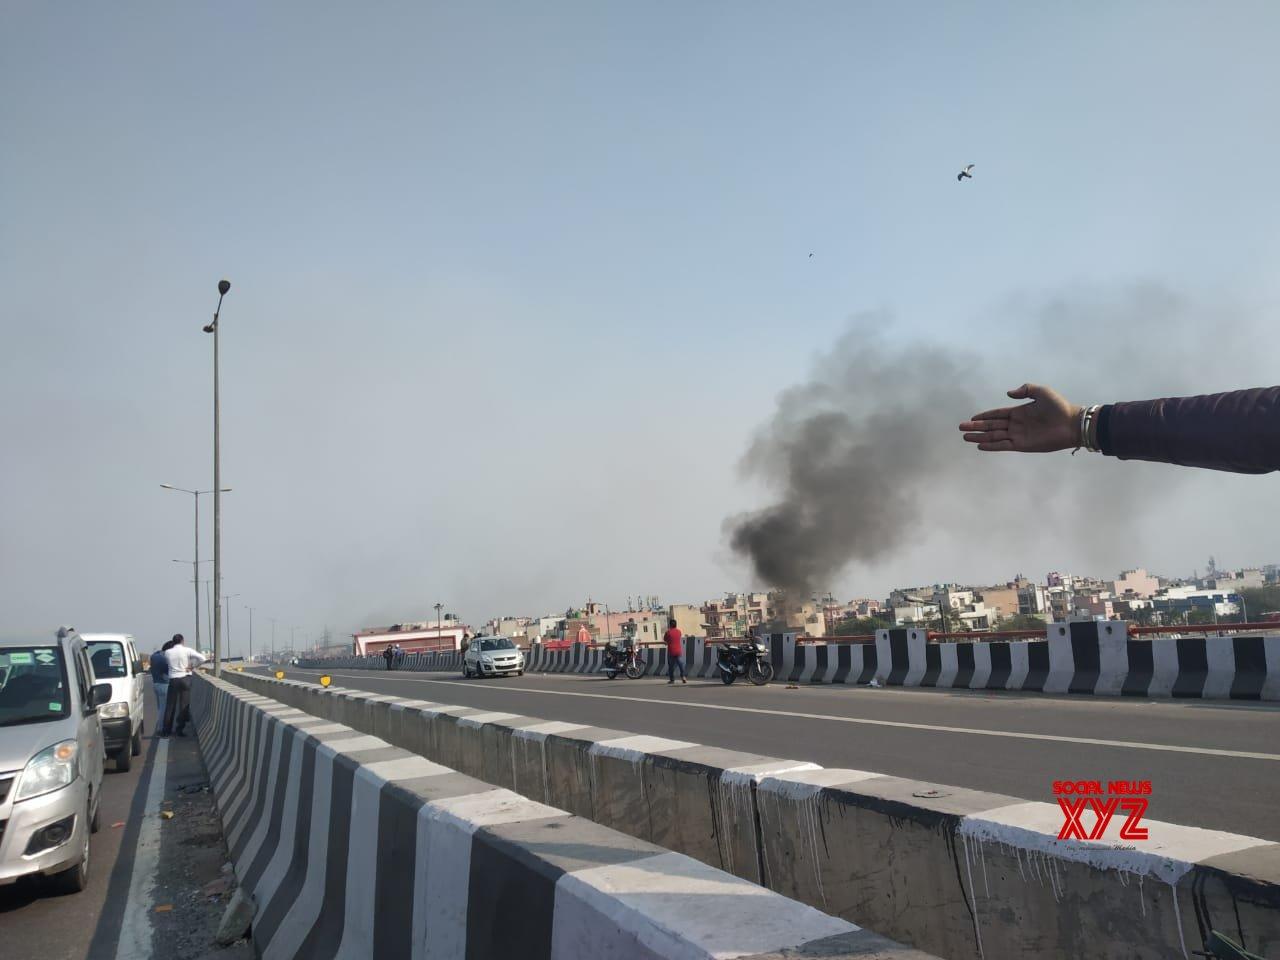 New Delhi: Protesters go on rampage in Bhajanpura - Yamuna Vihar area #Gallery